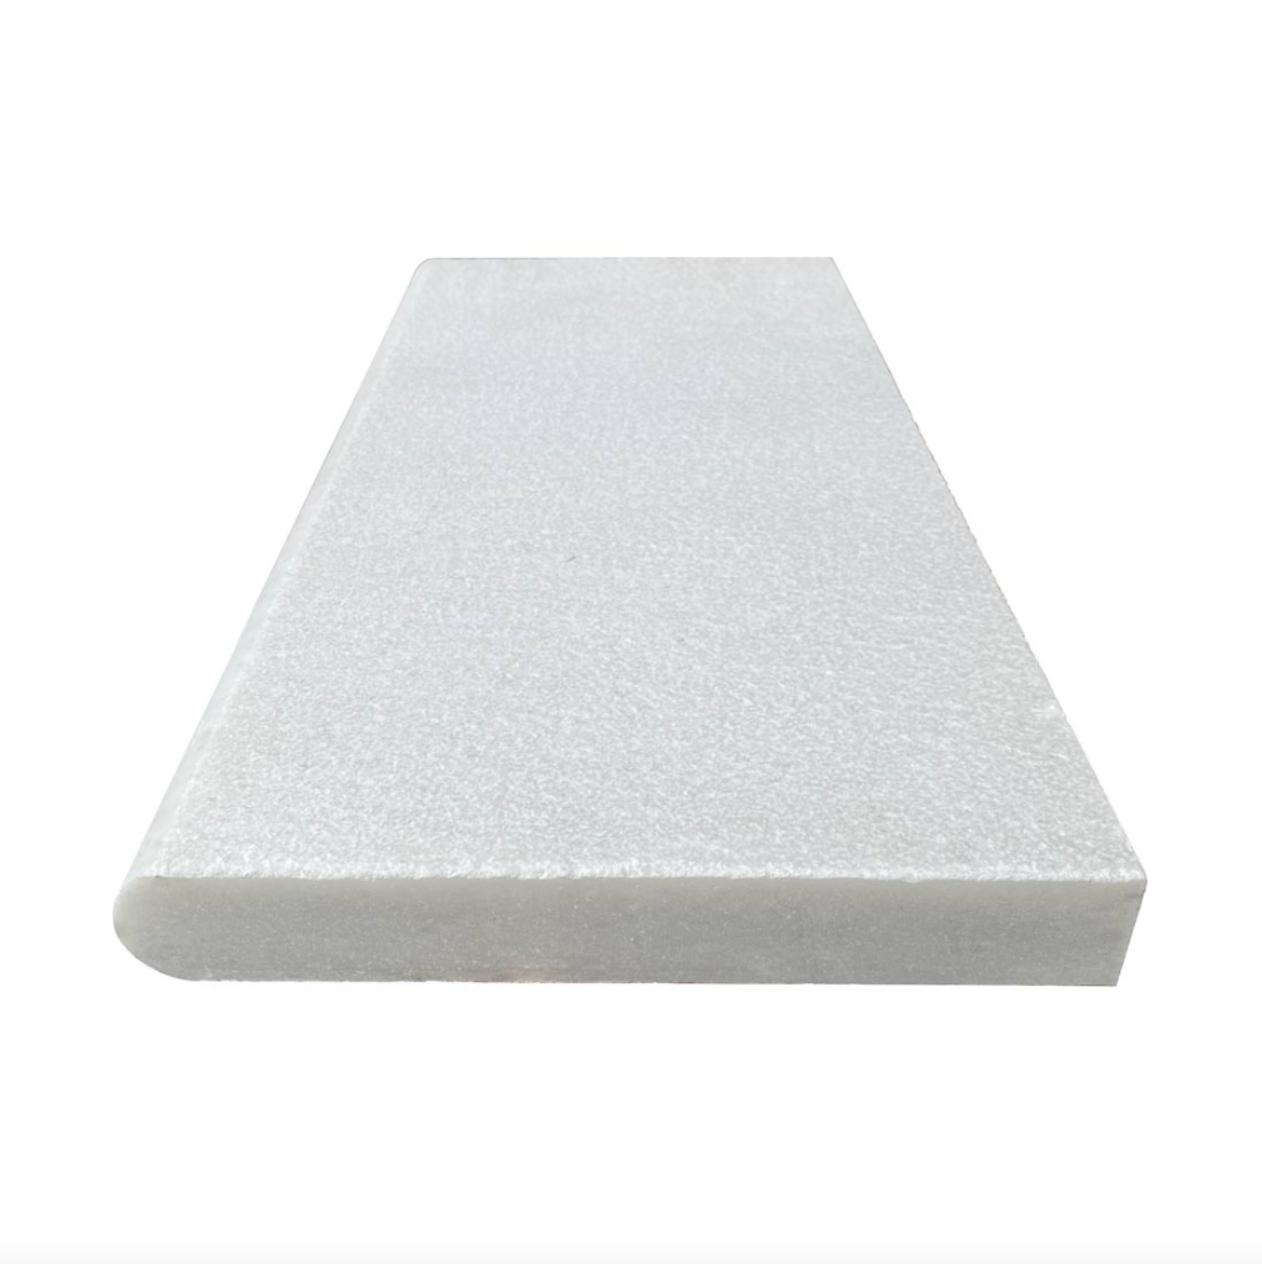 Royal Carrara Marble Paver Sandblasted Coping long side 12x24x2